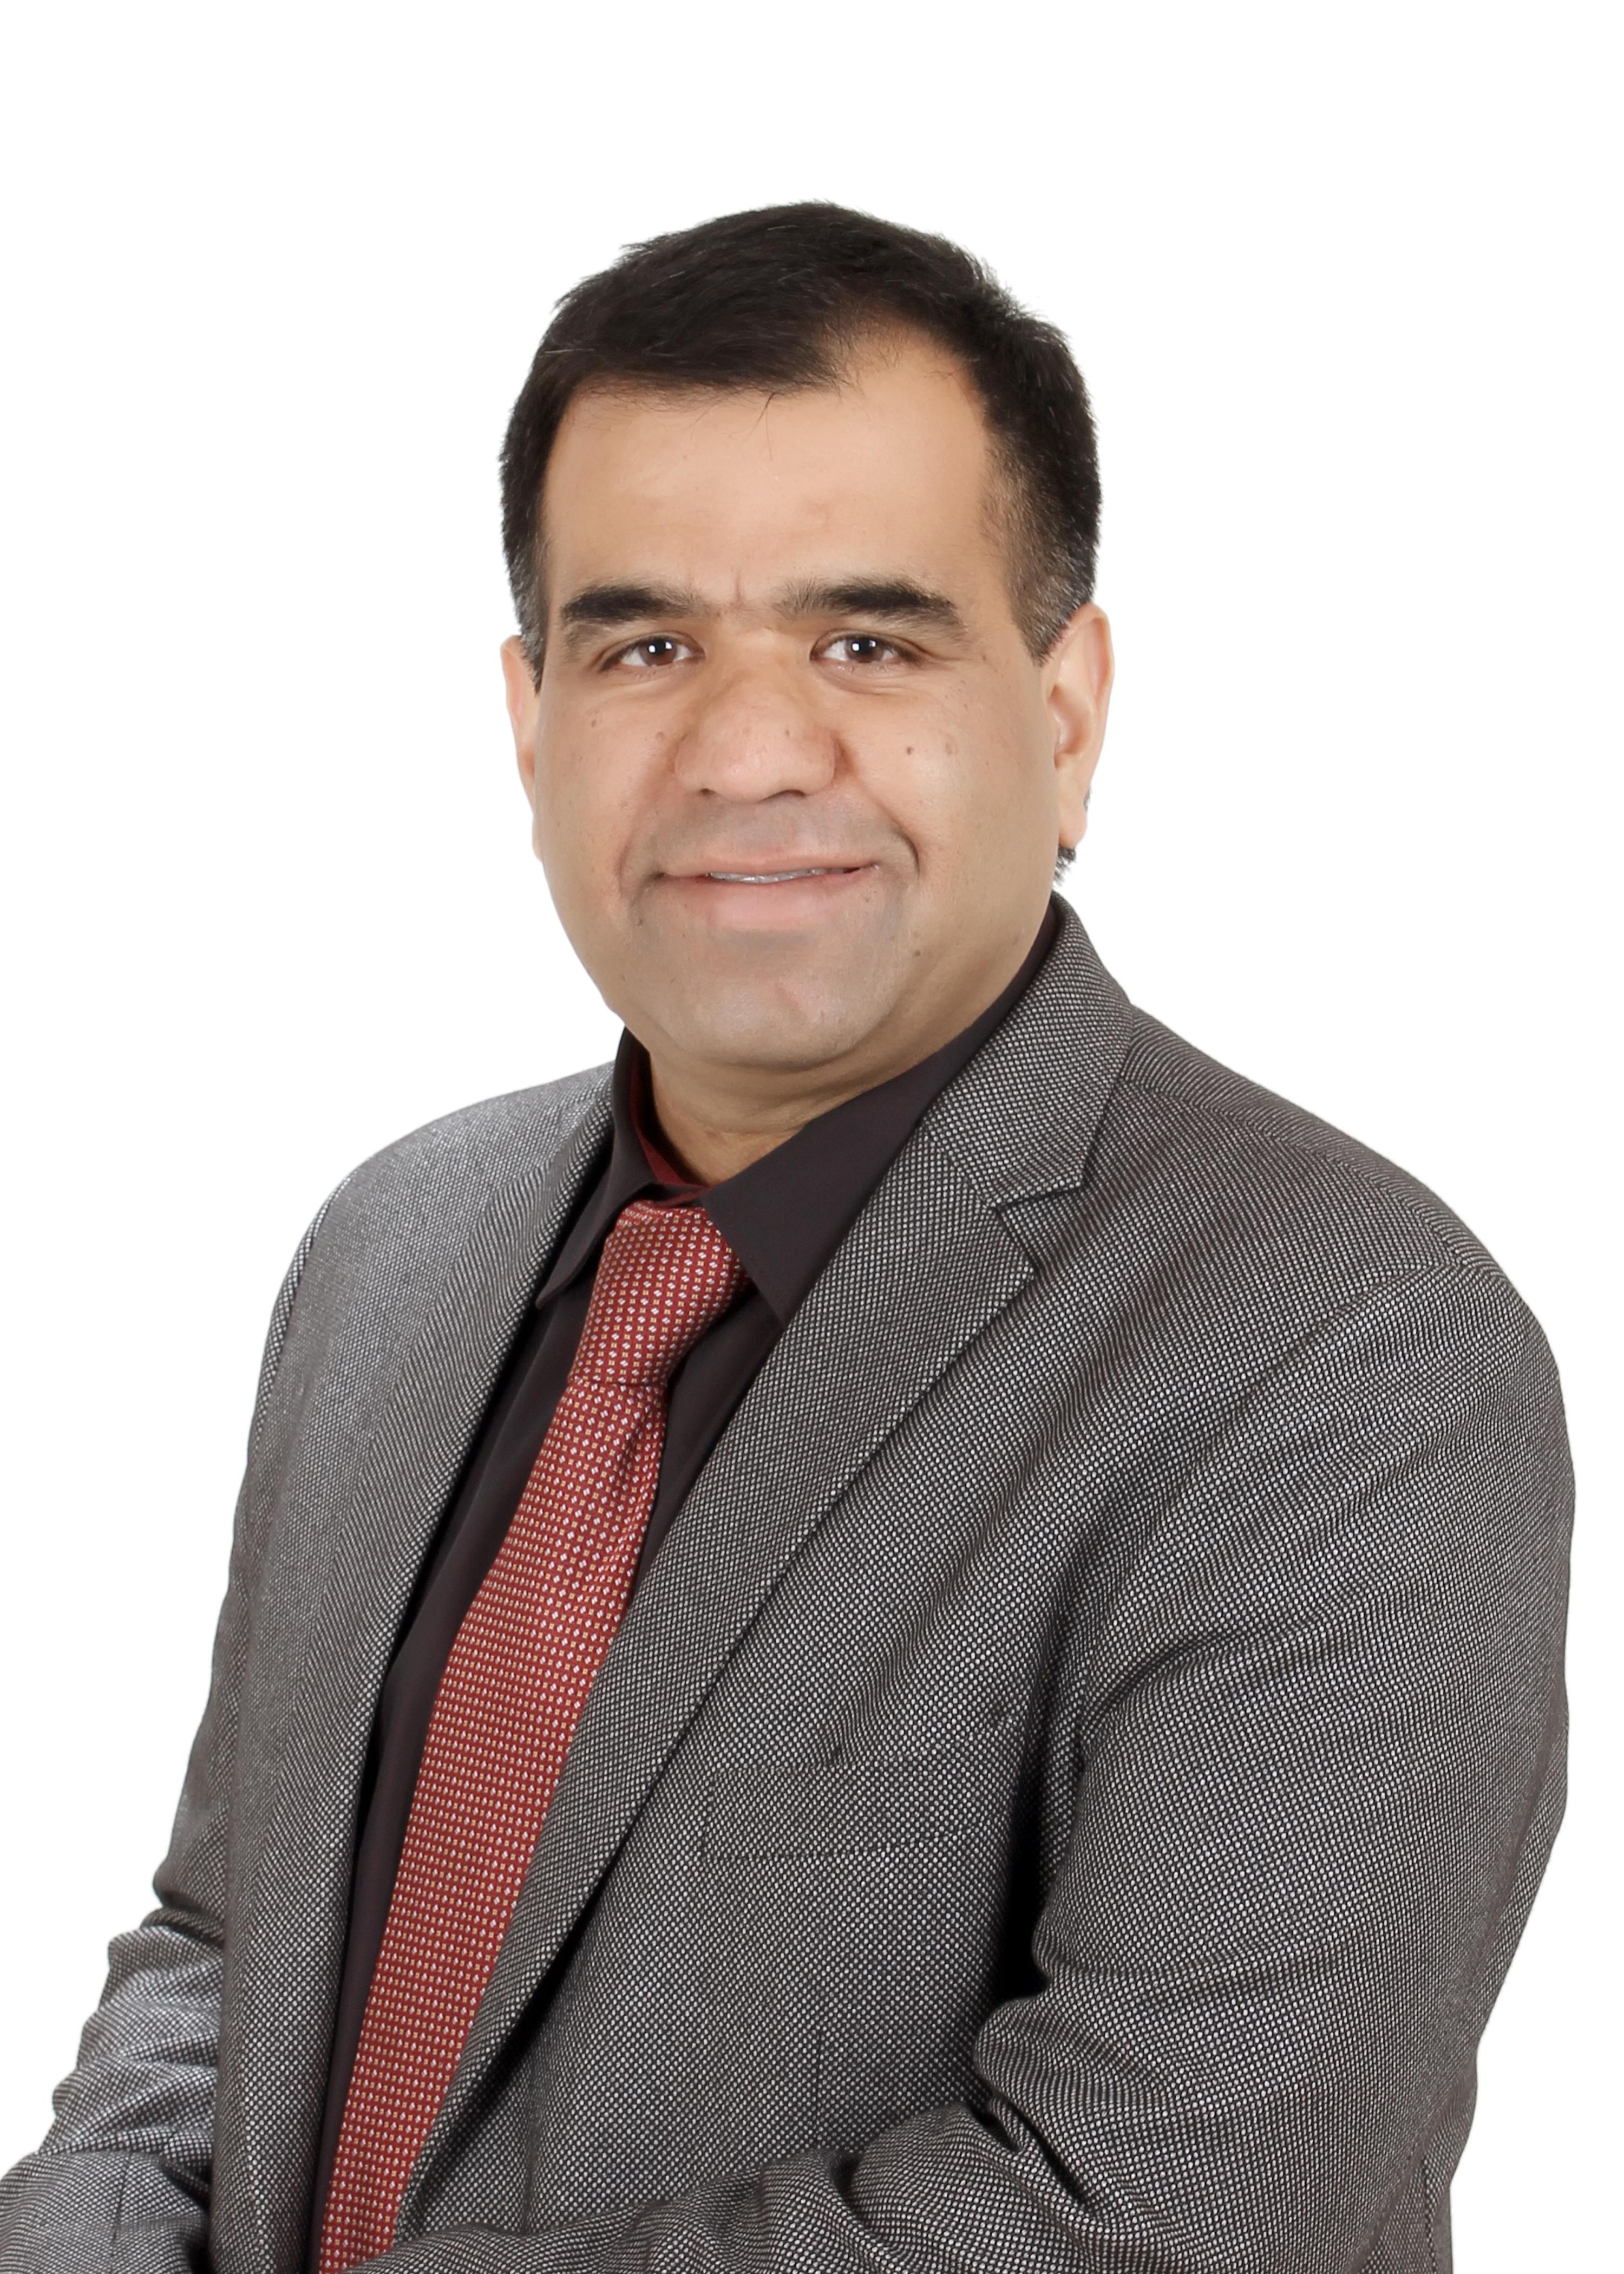 Mr. Tarun Bhatia, President-elect, NAR India